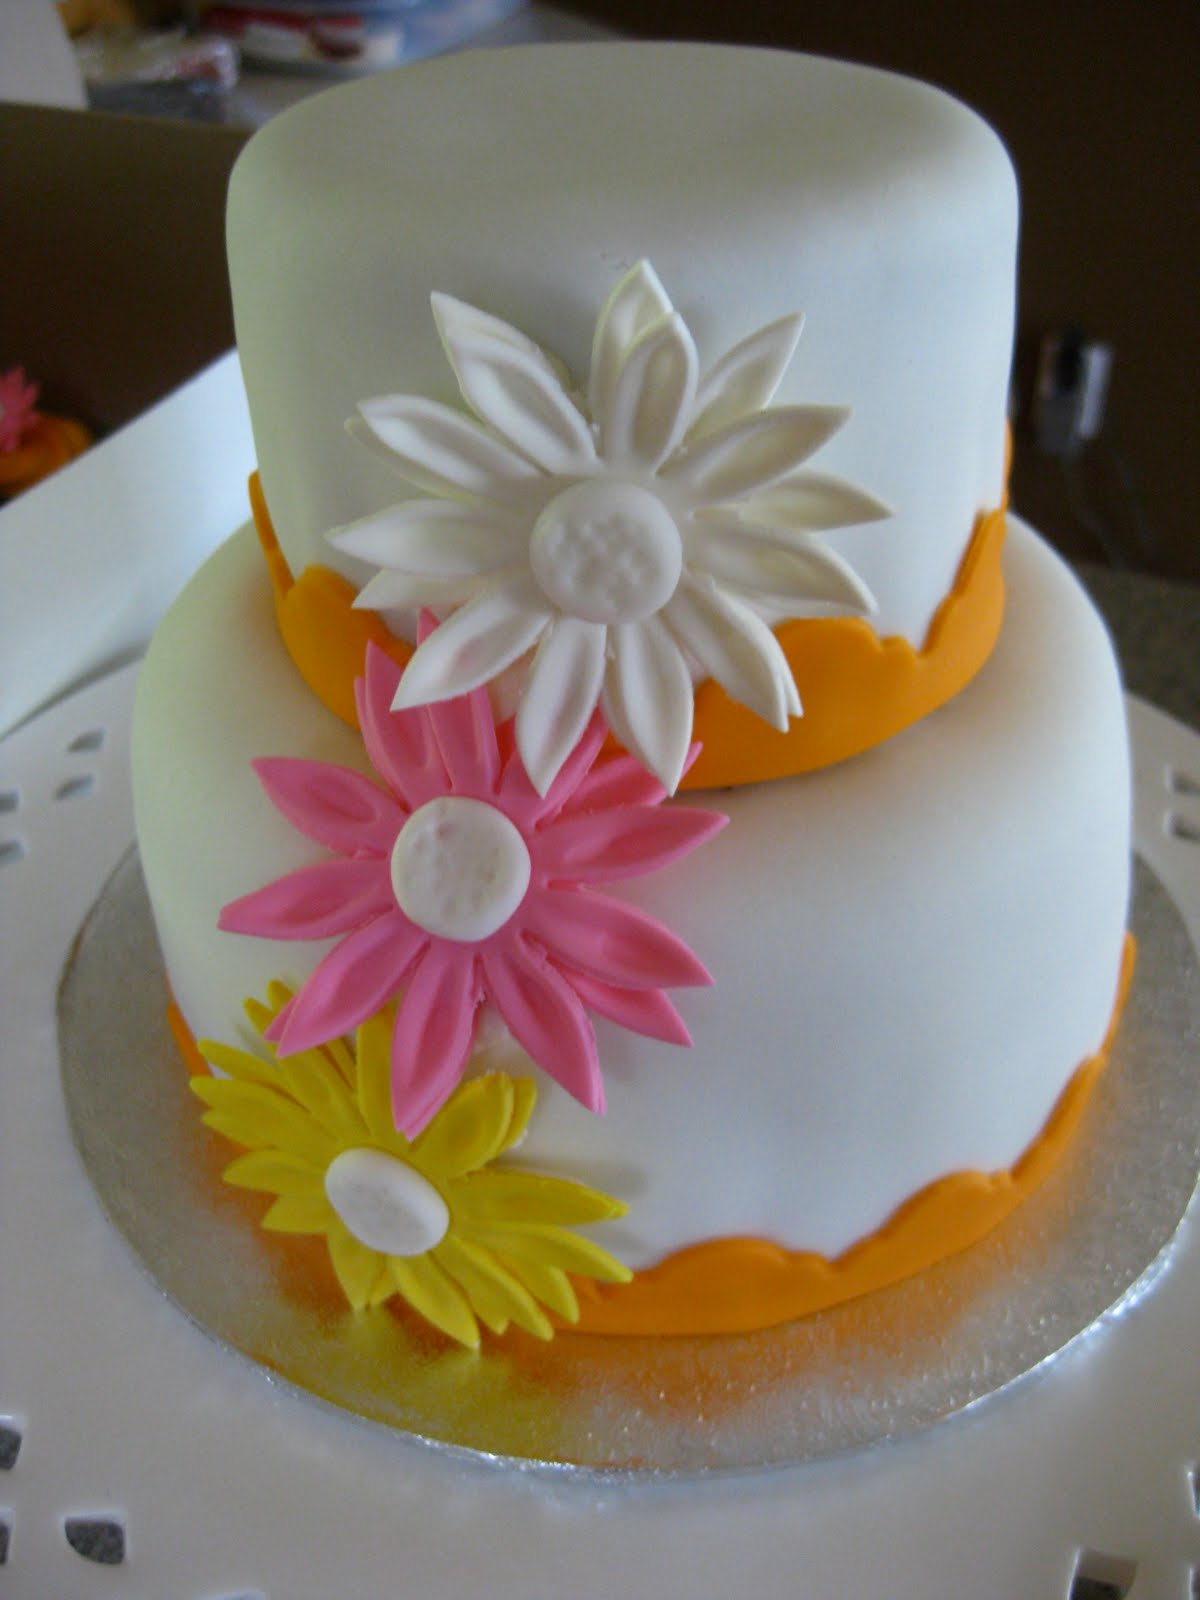 ROXIECAKES Vancouver Colorful Daisy Wedding Cupcakes & Cake